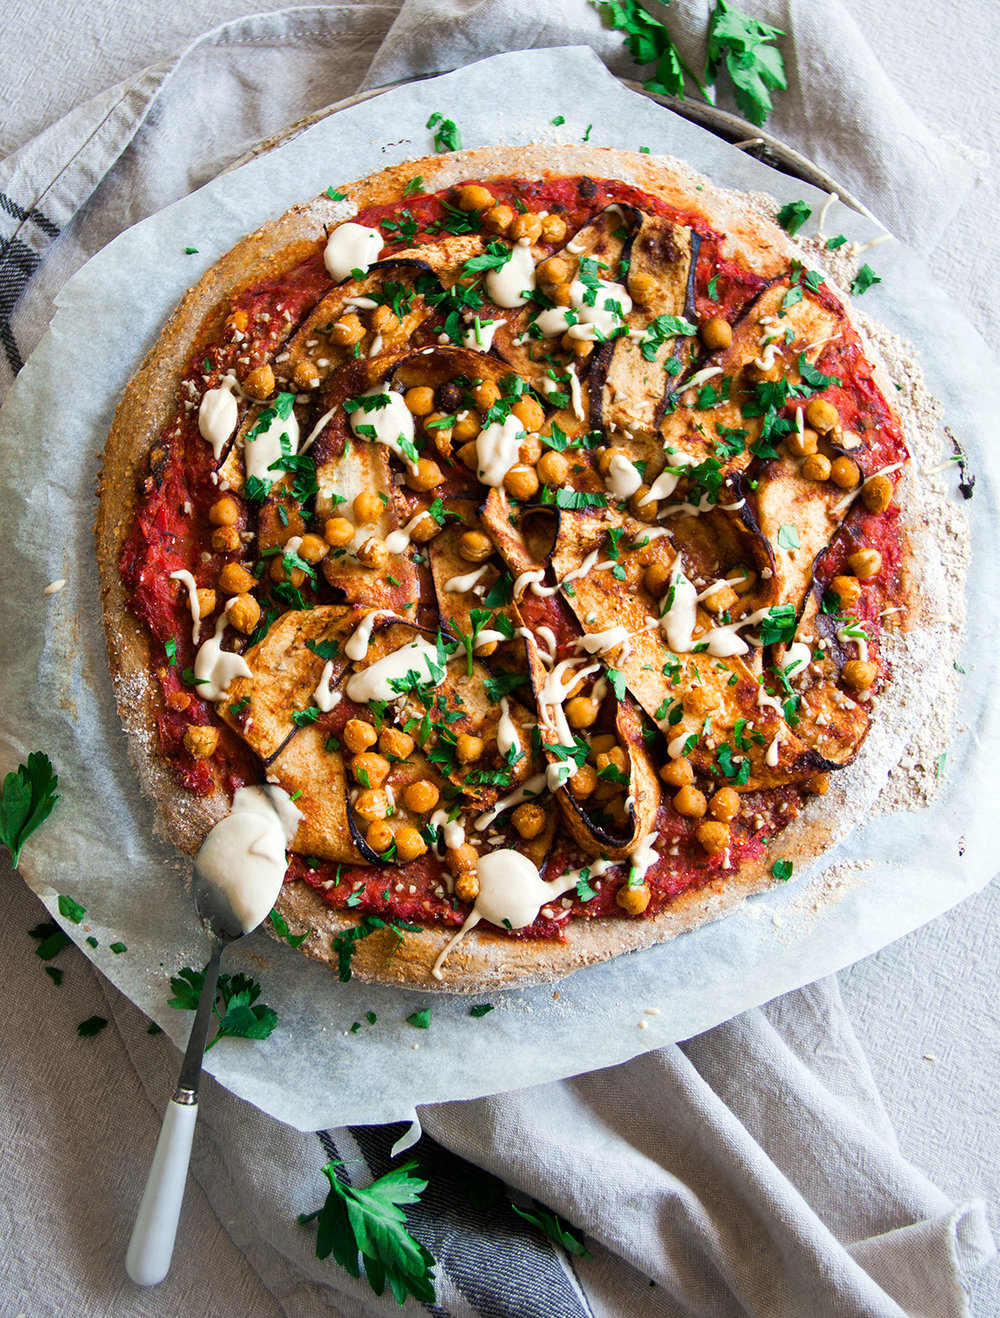 pizza-harissa-aubergines-kruidige-kikkererwten-vegan-whole-foods-olievrij.jpg